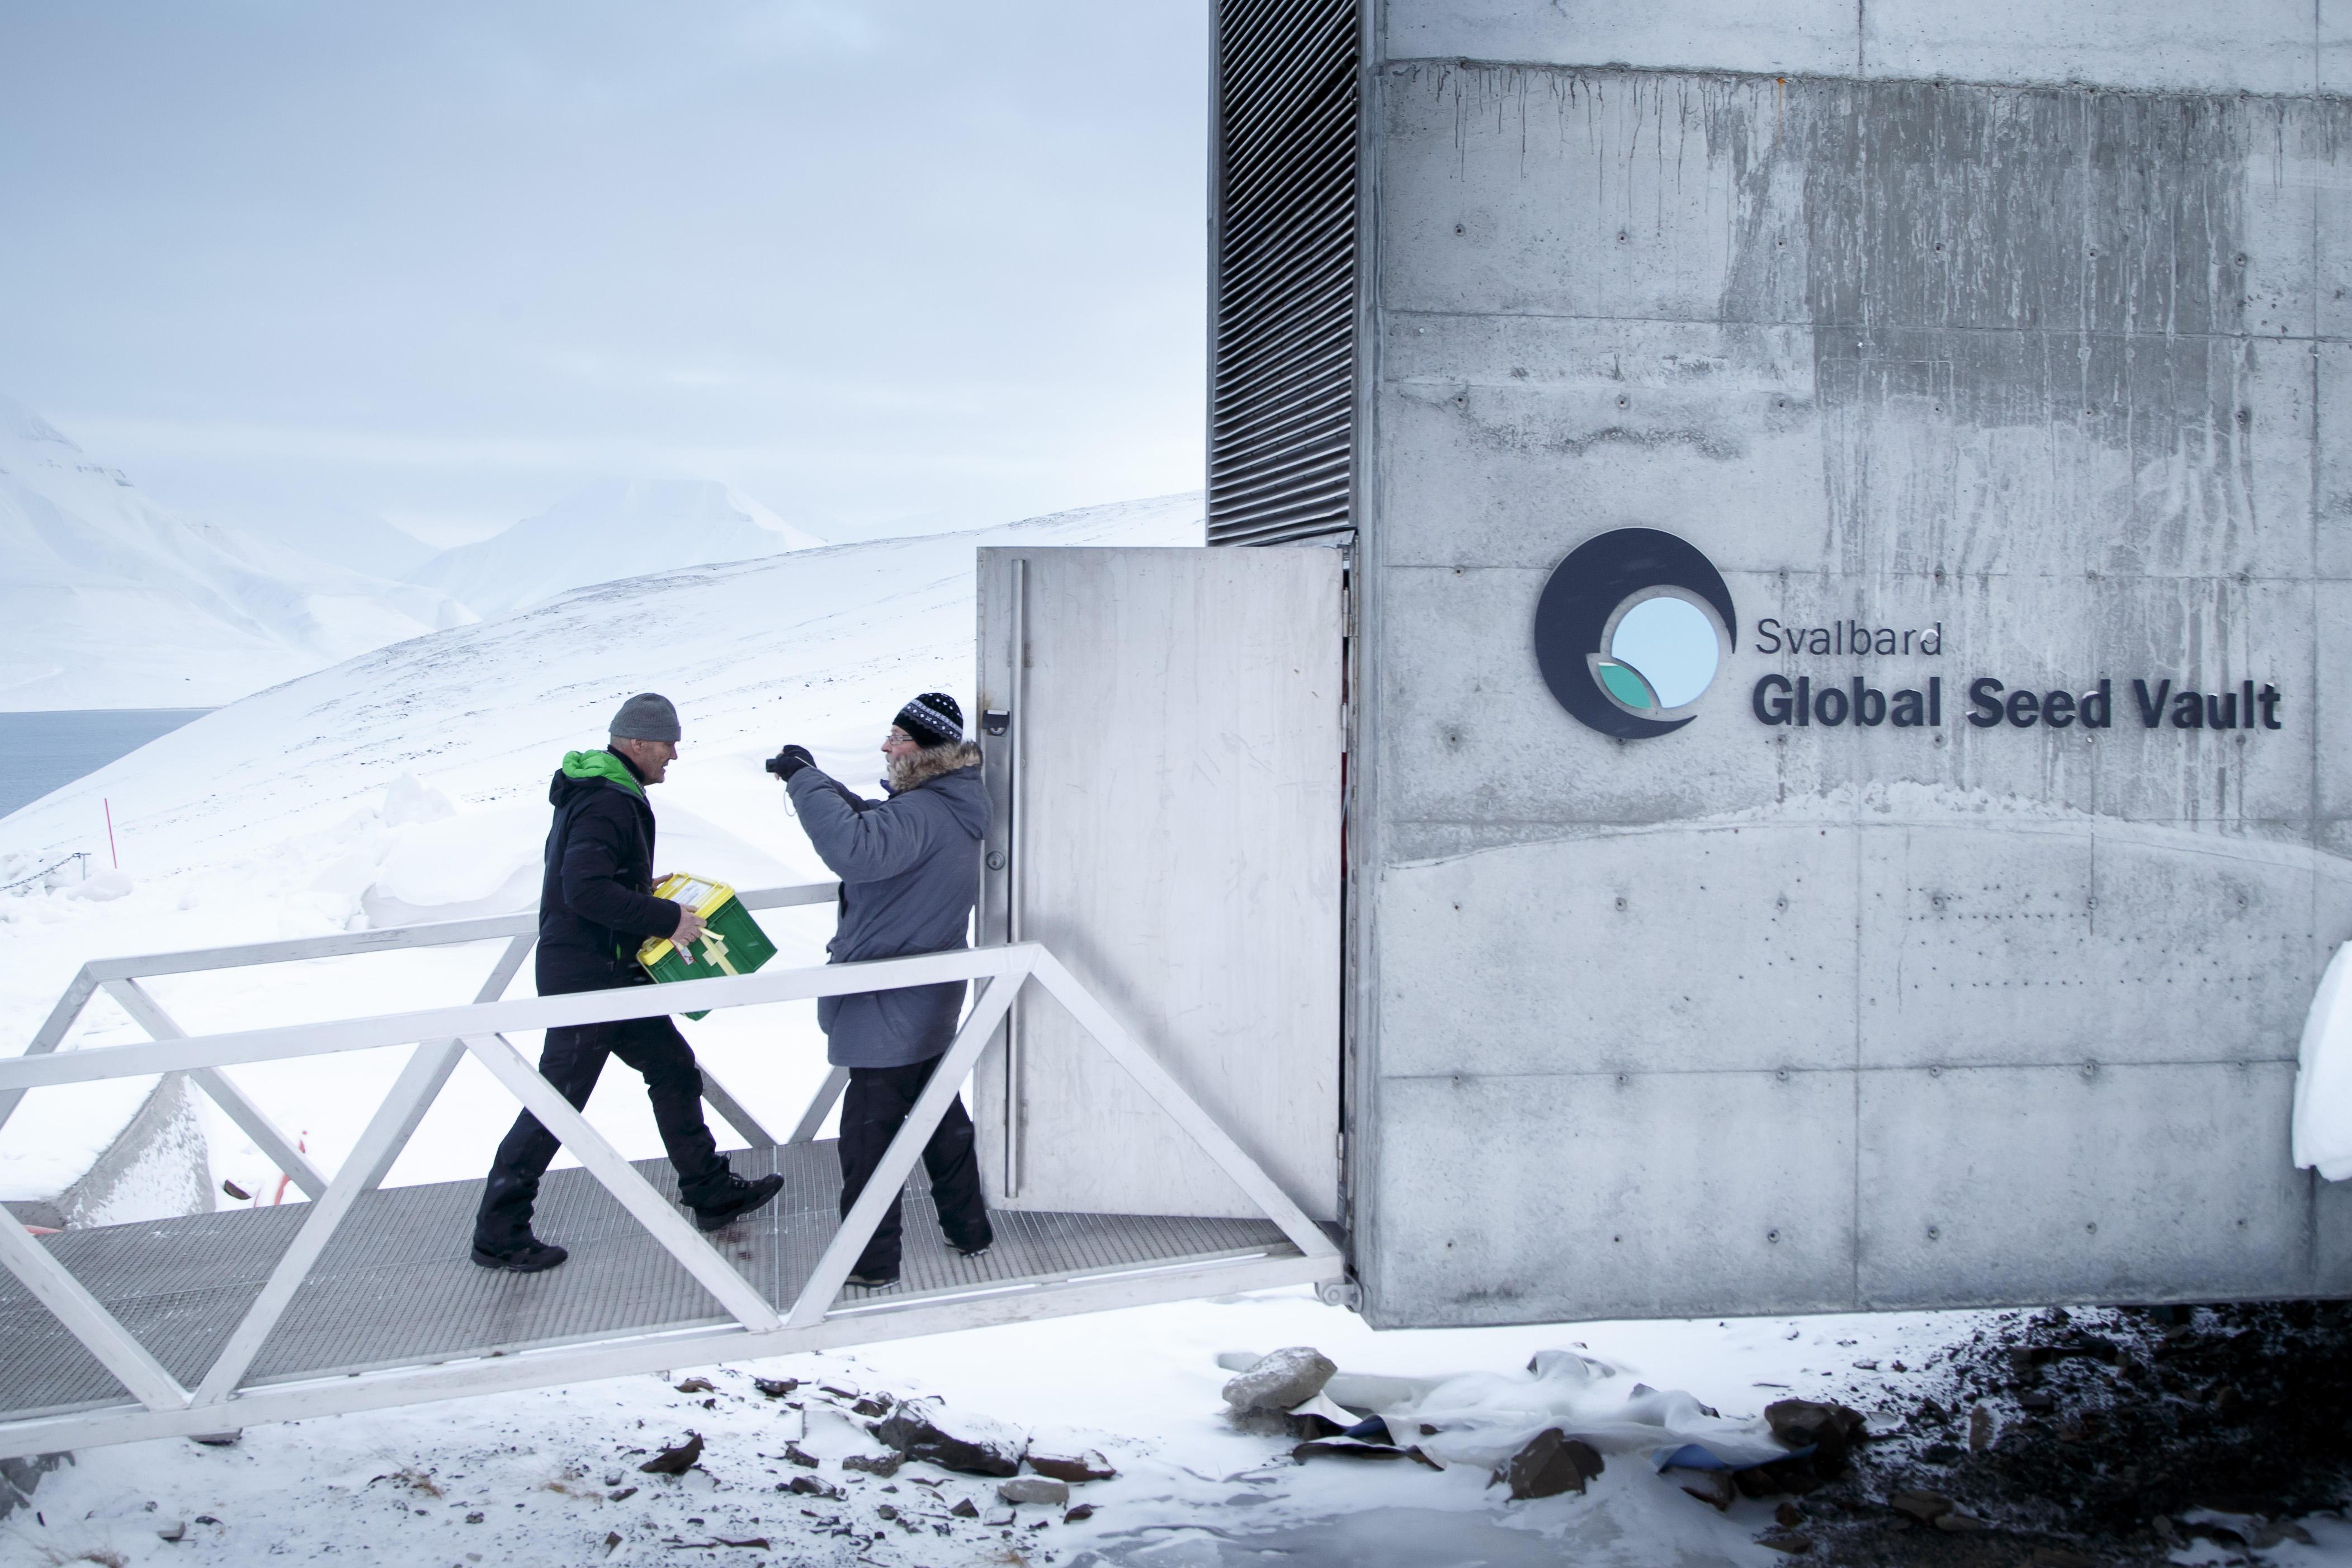 Arctic Doomsday Seed Vault Receives 50 000 New Deposits Cbs News